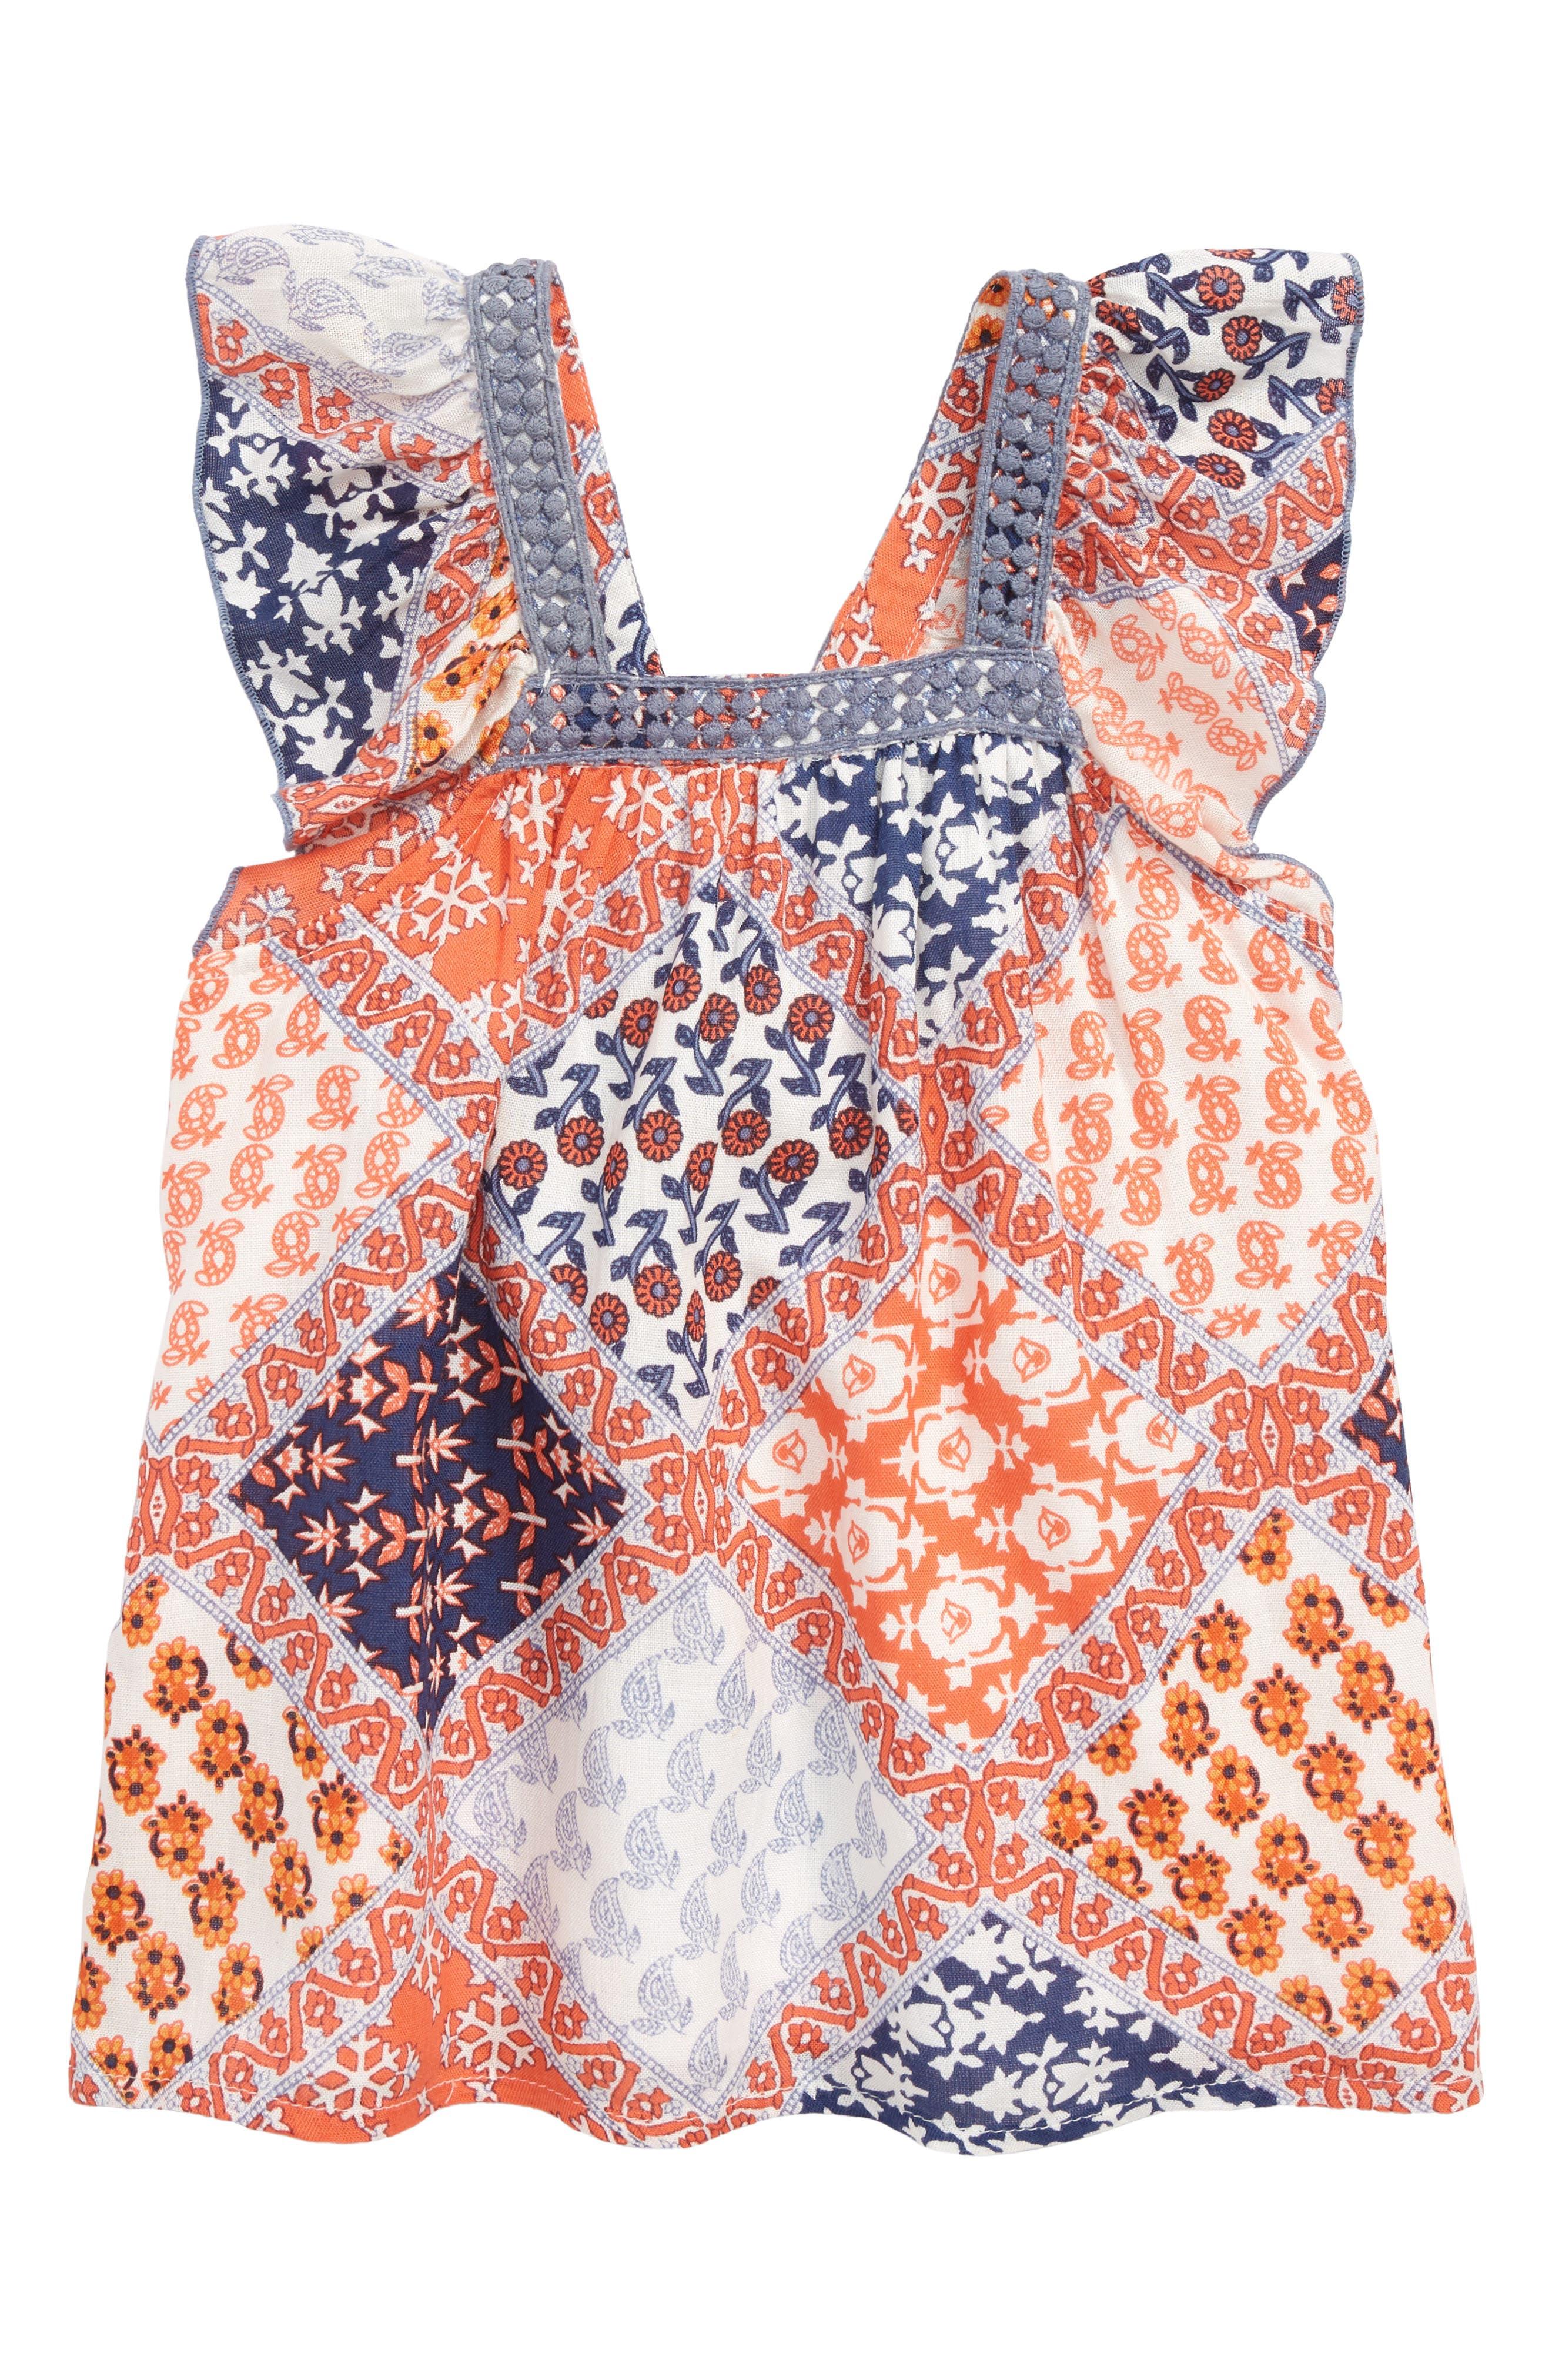 Molly Patch Top,                         Main,                         color, Orange